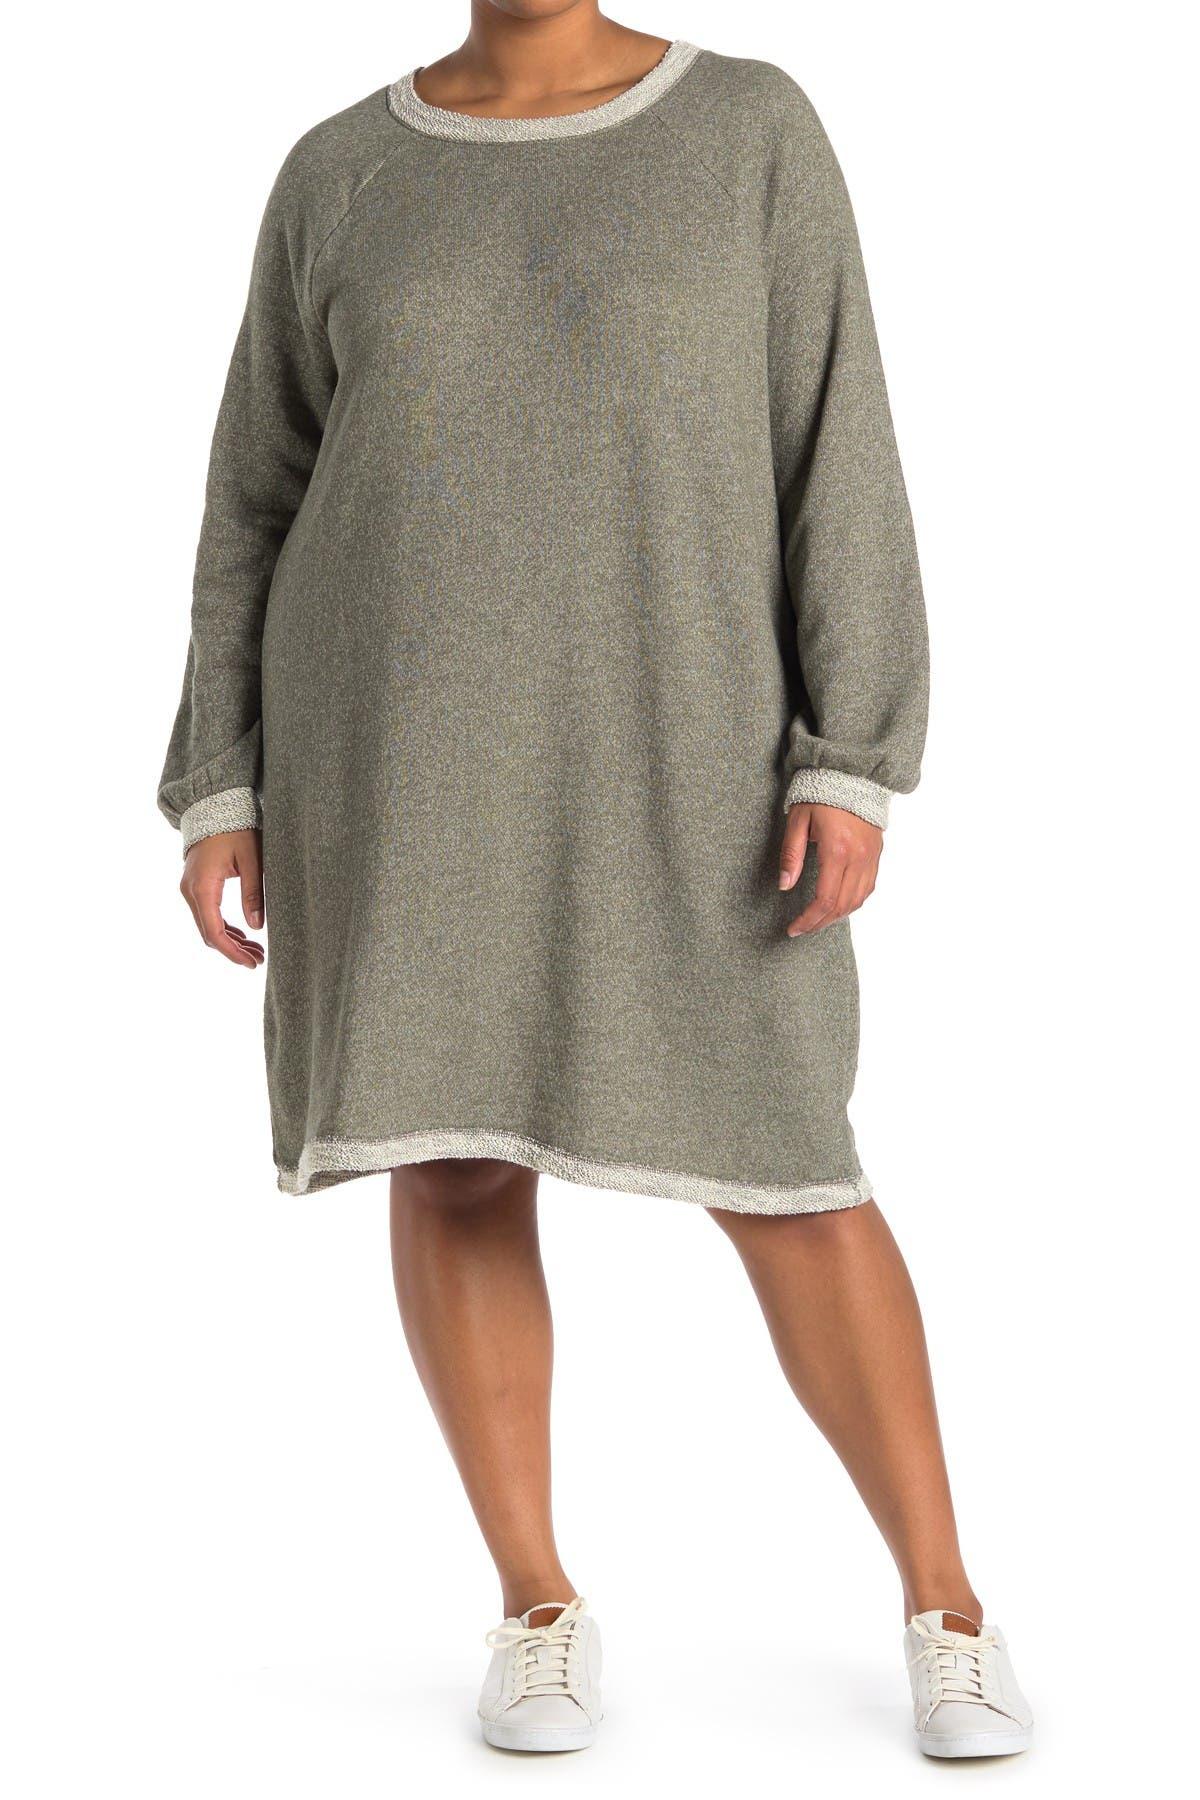 Image of SUSINA Sweatshirt Dress